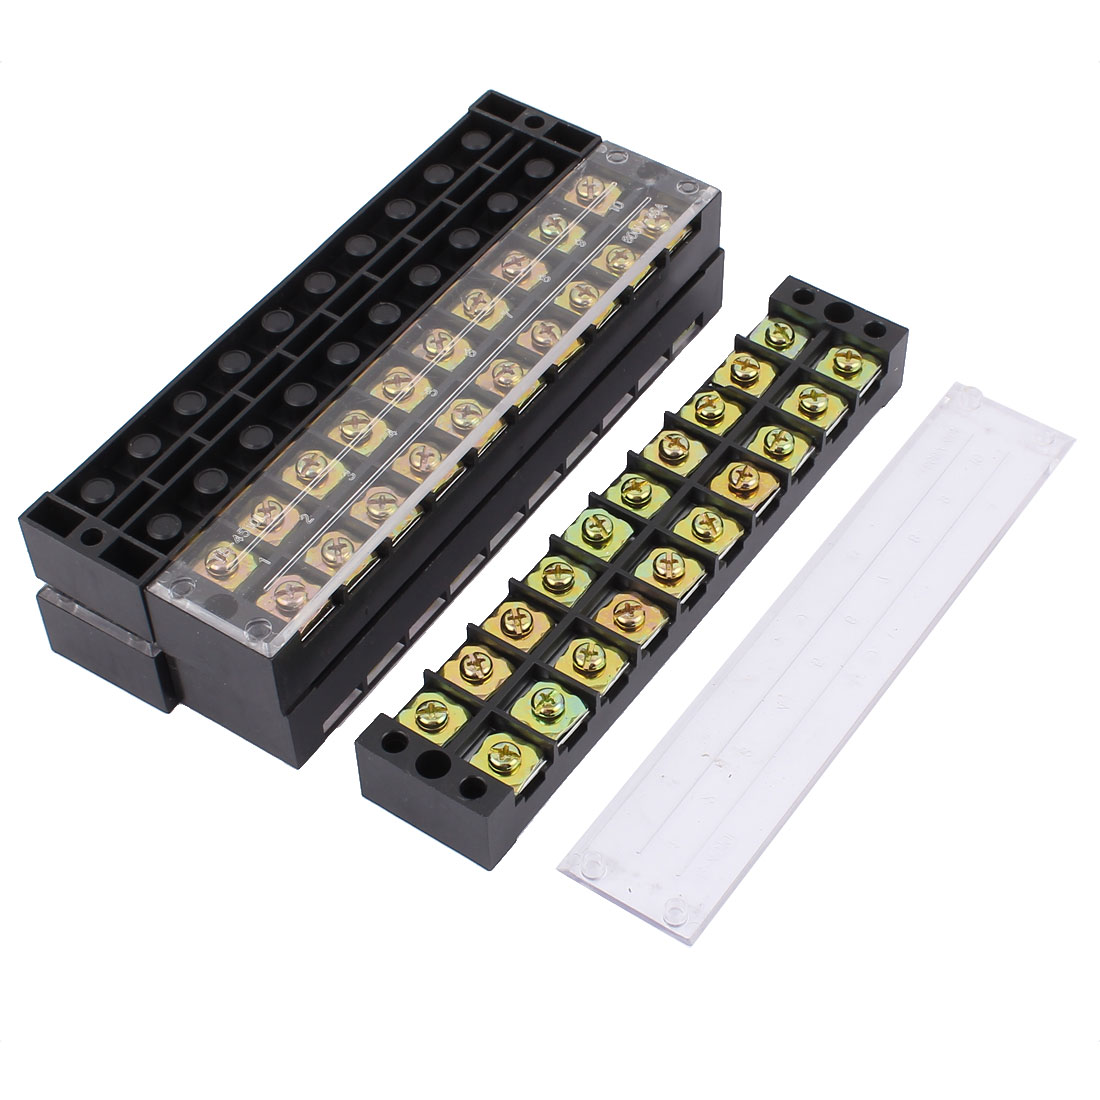 5 Pcs 600V 45A Double Row 10 Position Screw Terminal Barrier Blocks TB4510